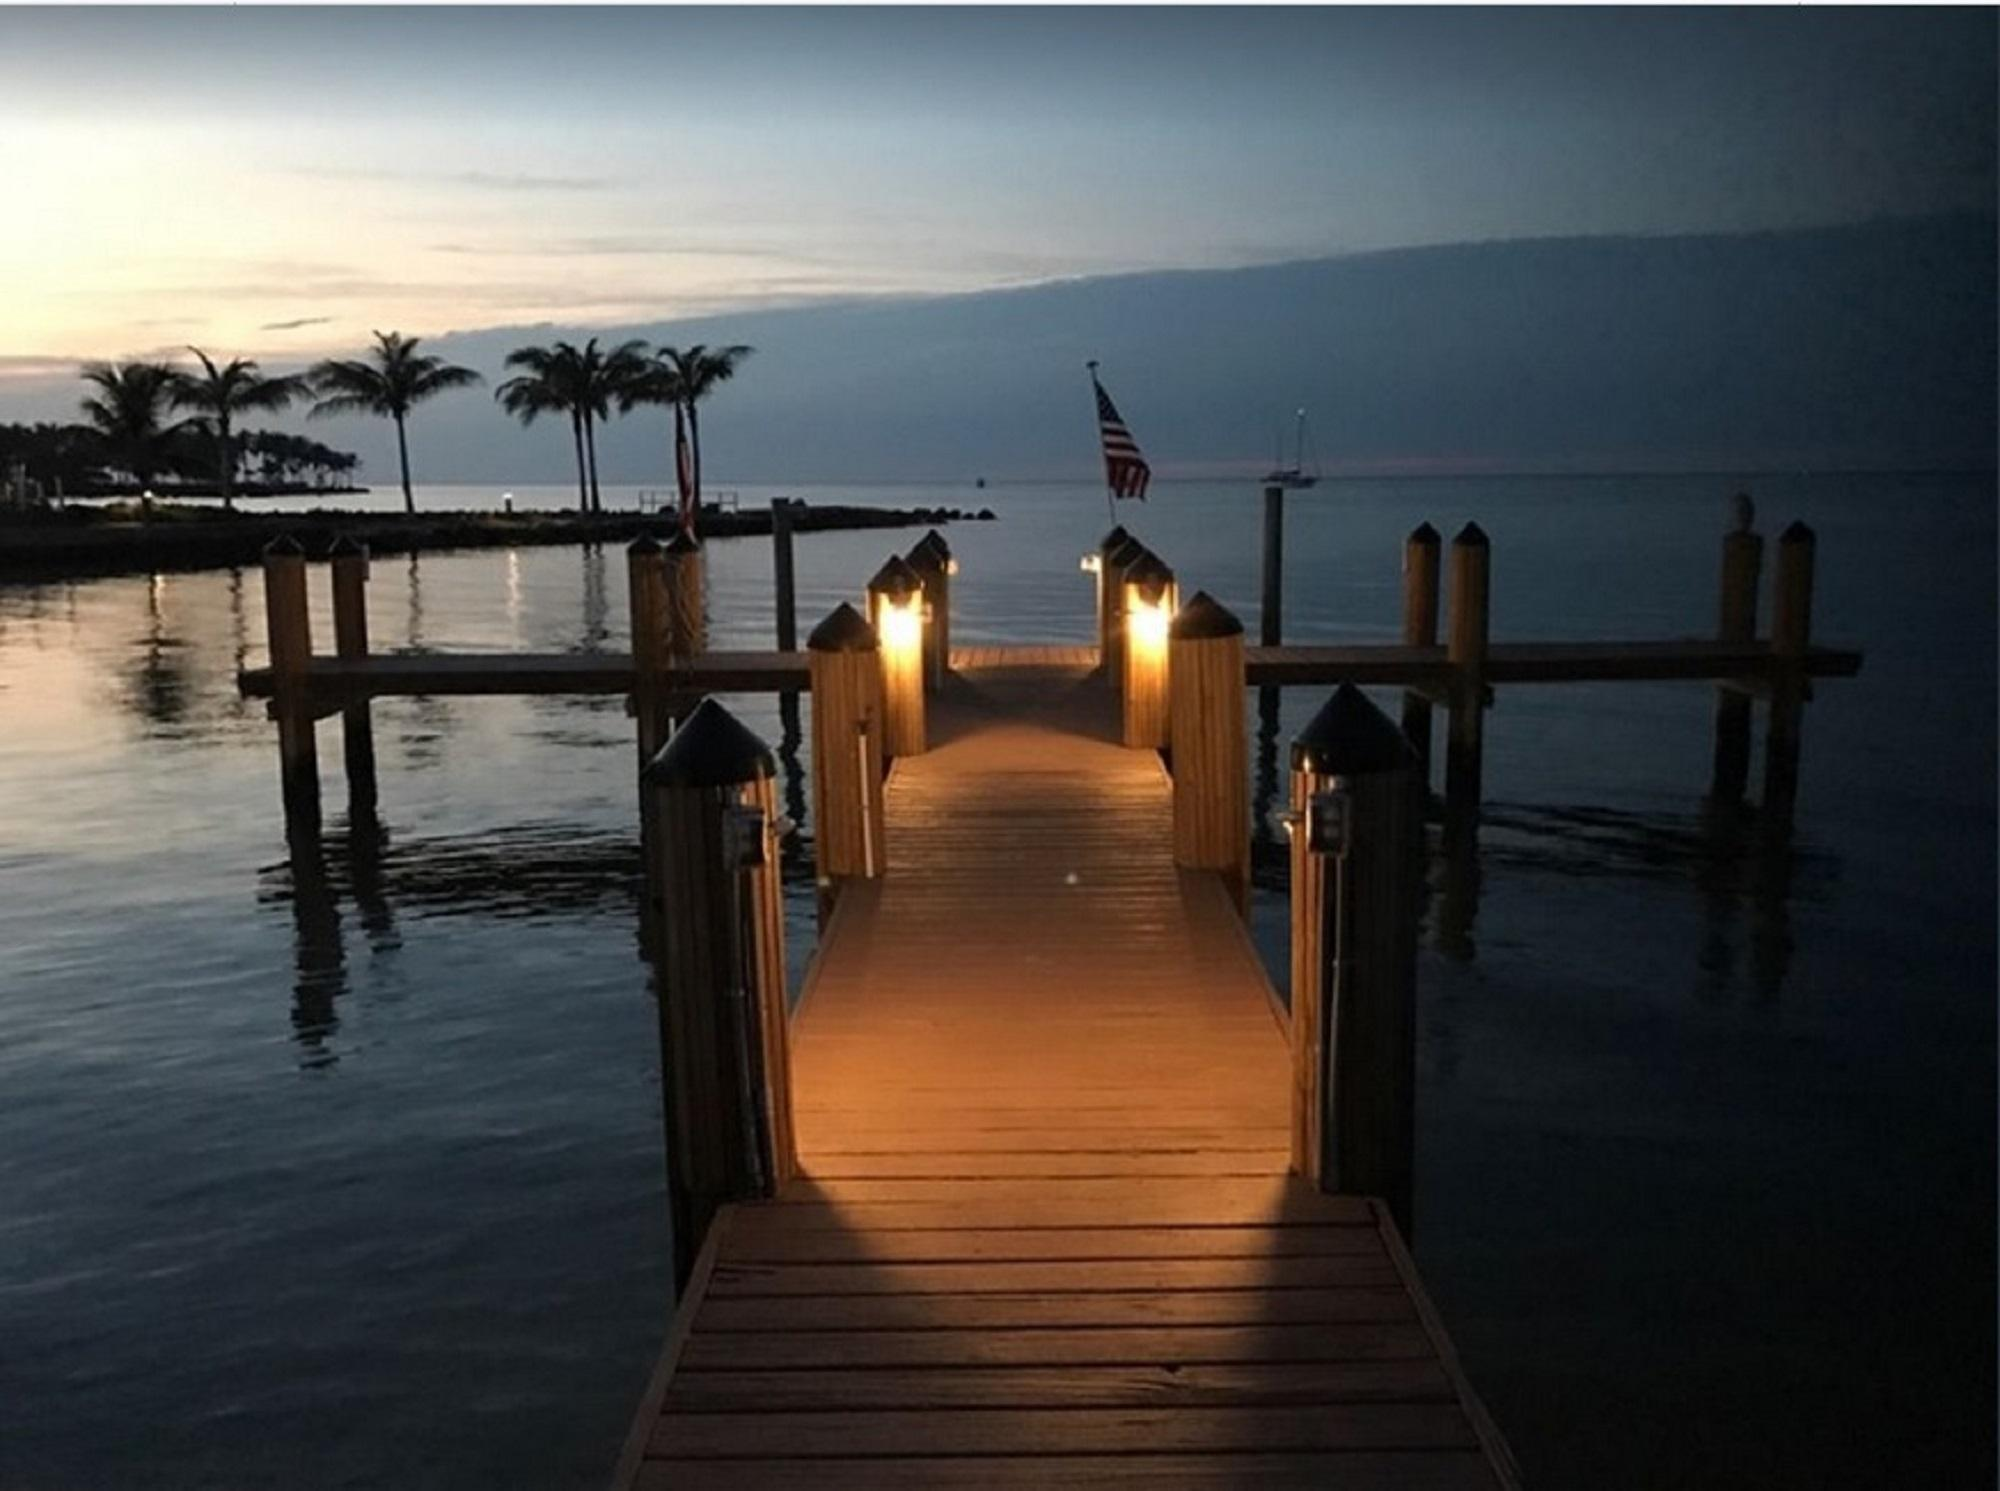 Dock At Sundown. Night Fishing Or Watch Star Sky